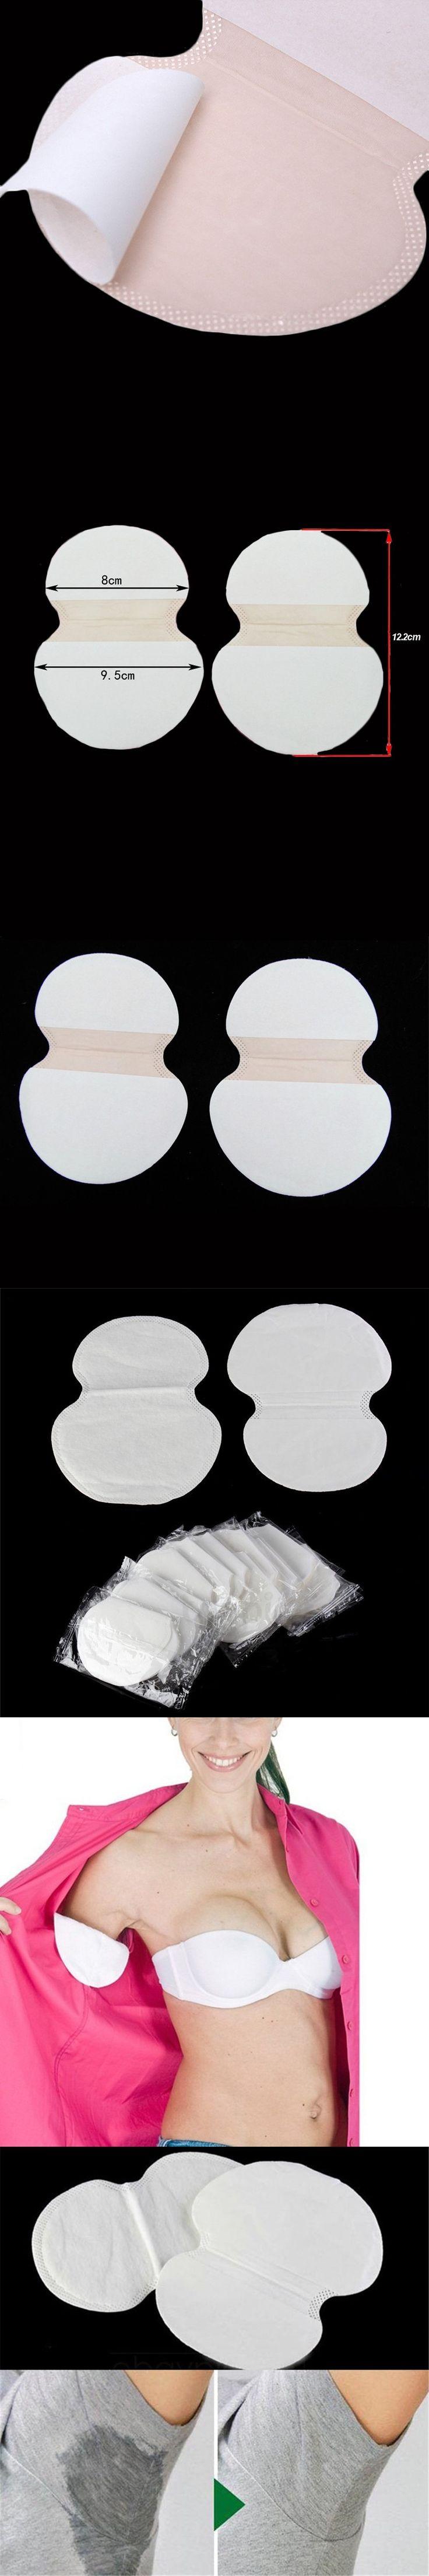 400pcs=200Pairs/lot Cotton Sweat Pads For Underarm Sweat Disposable Armpits Anti Perspirant Pad Deodorant For Men Women New